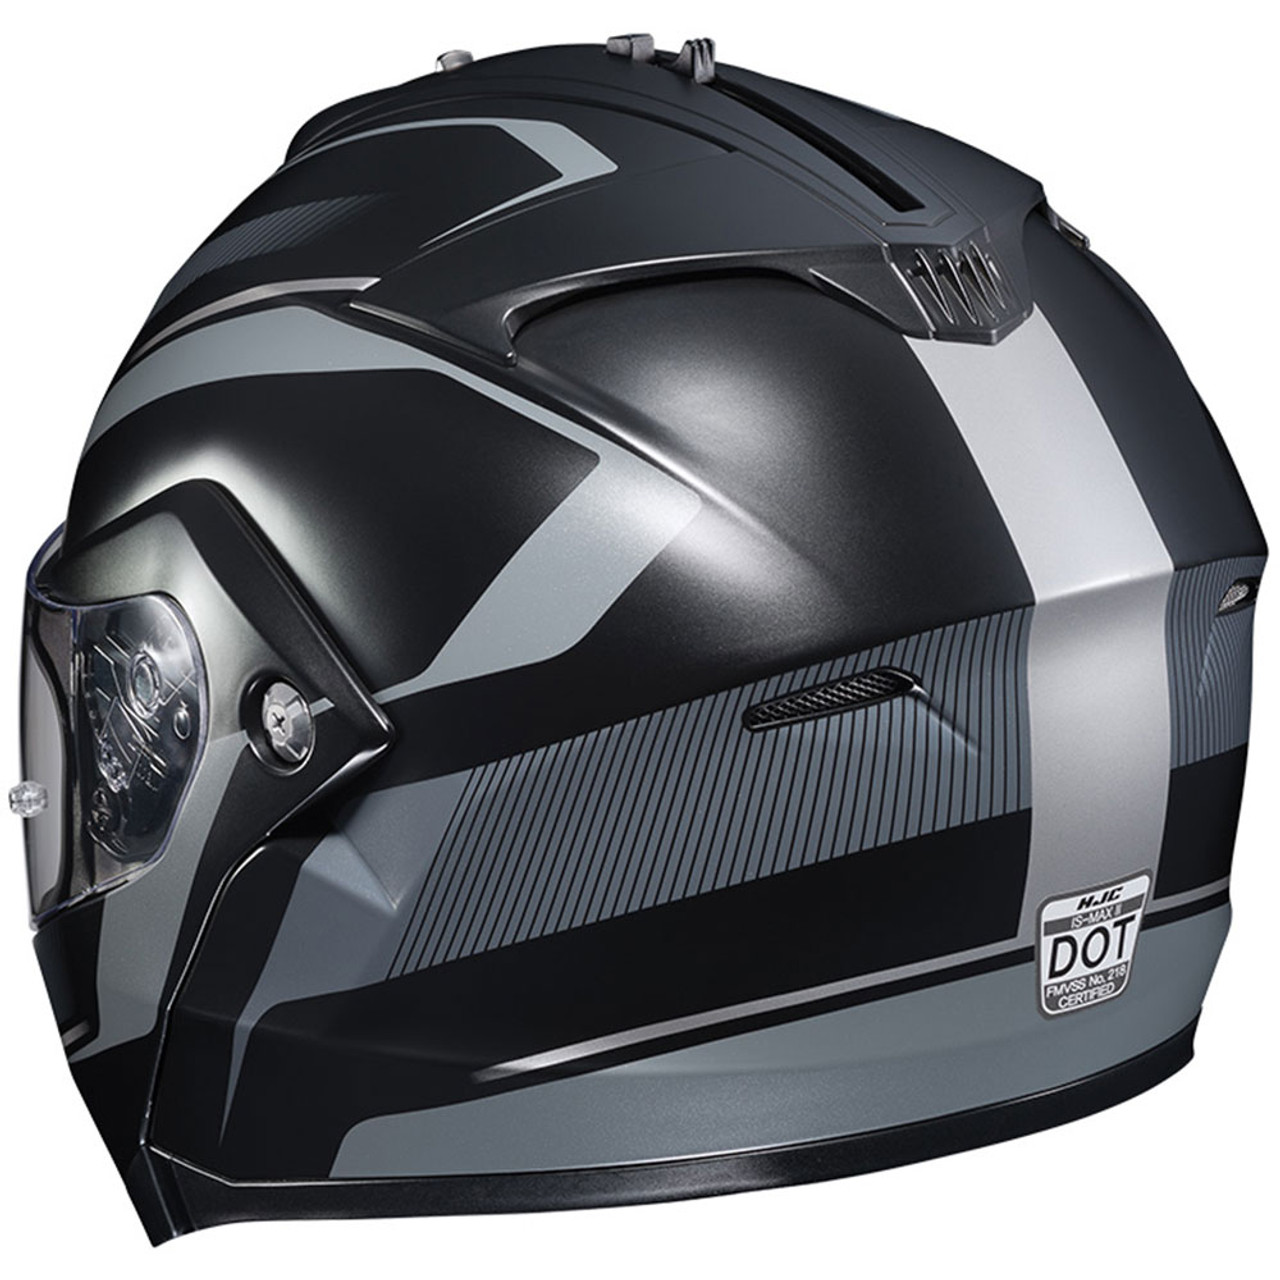 bf72bff283421 HJC IS-Max 2 Style Modular Motorcycle Helmet - MC-5F - Get Lowered ...